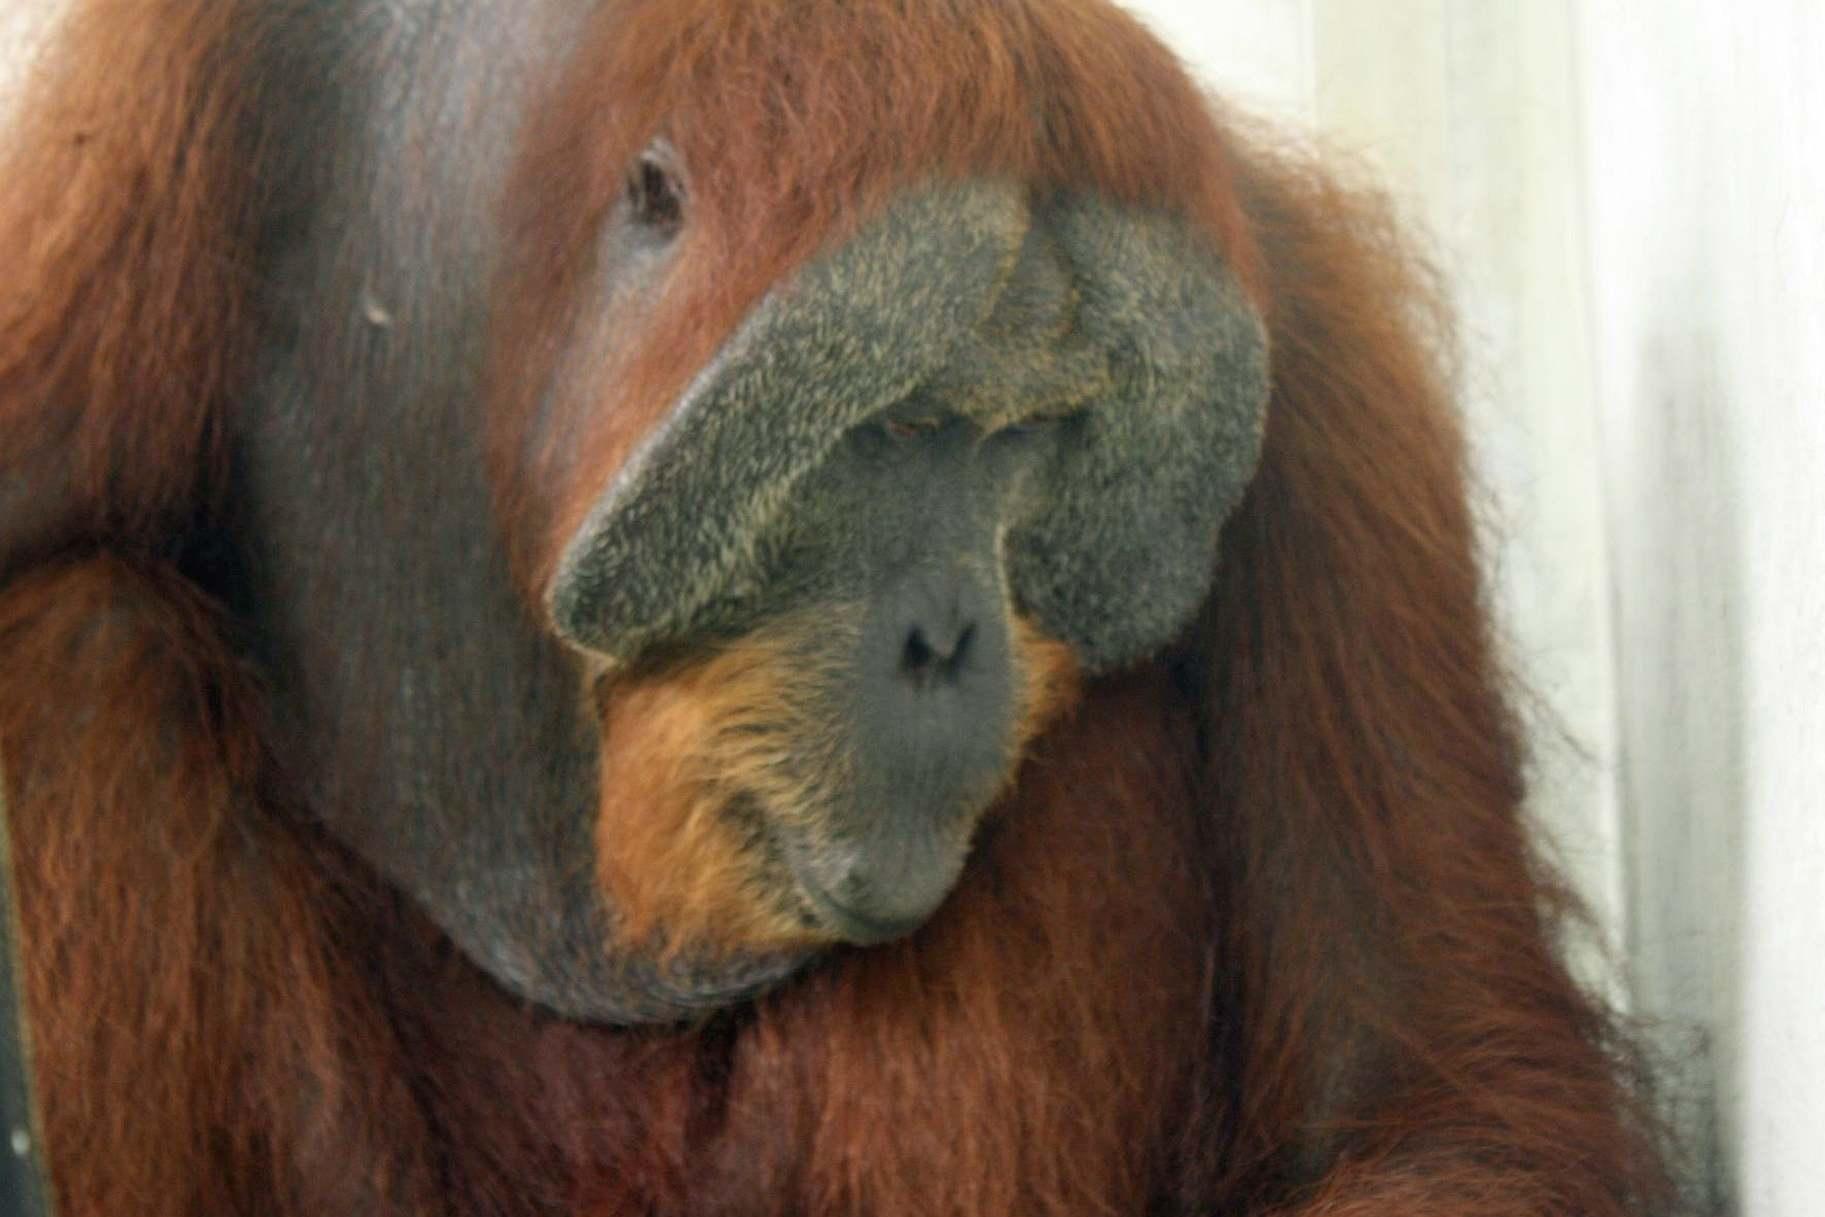 Critically endangered Sumatran orangutan found alive after being sho…